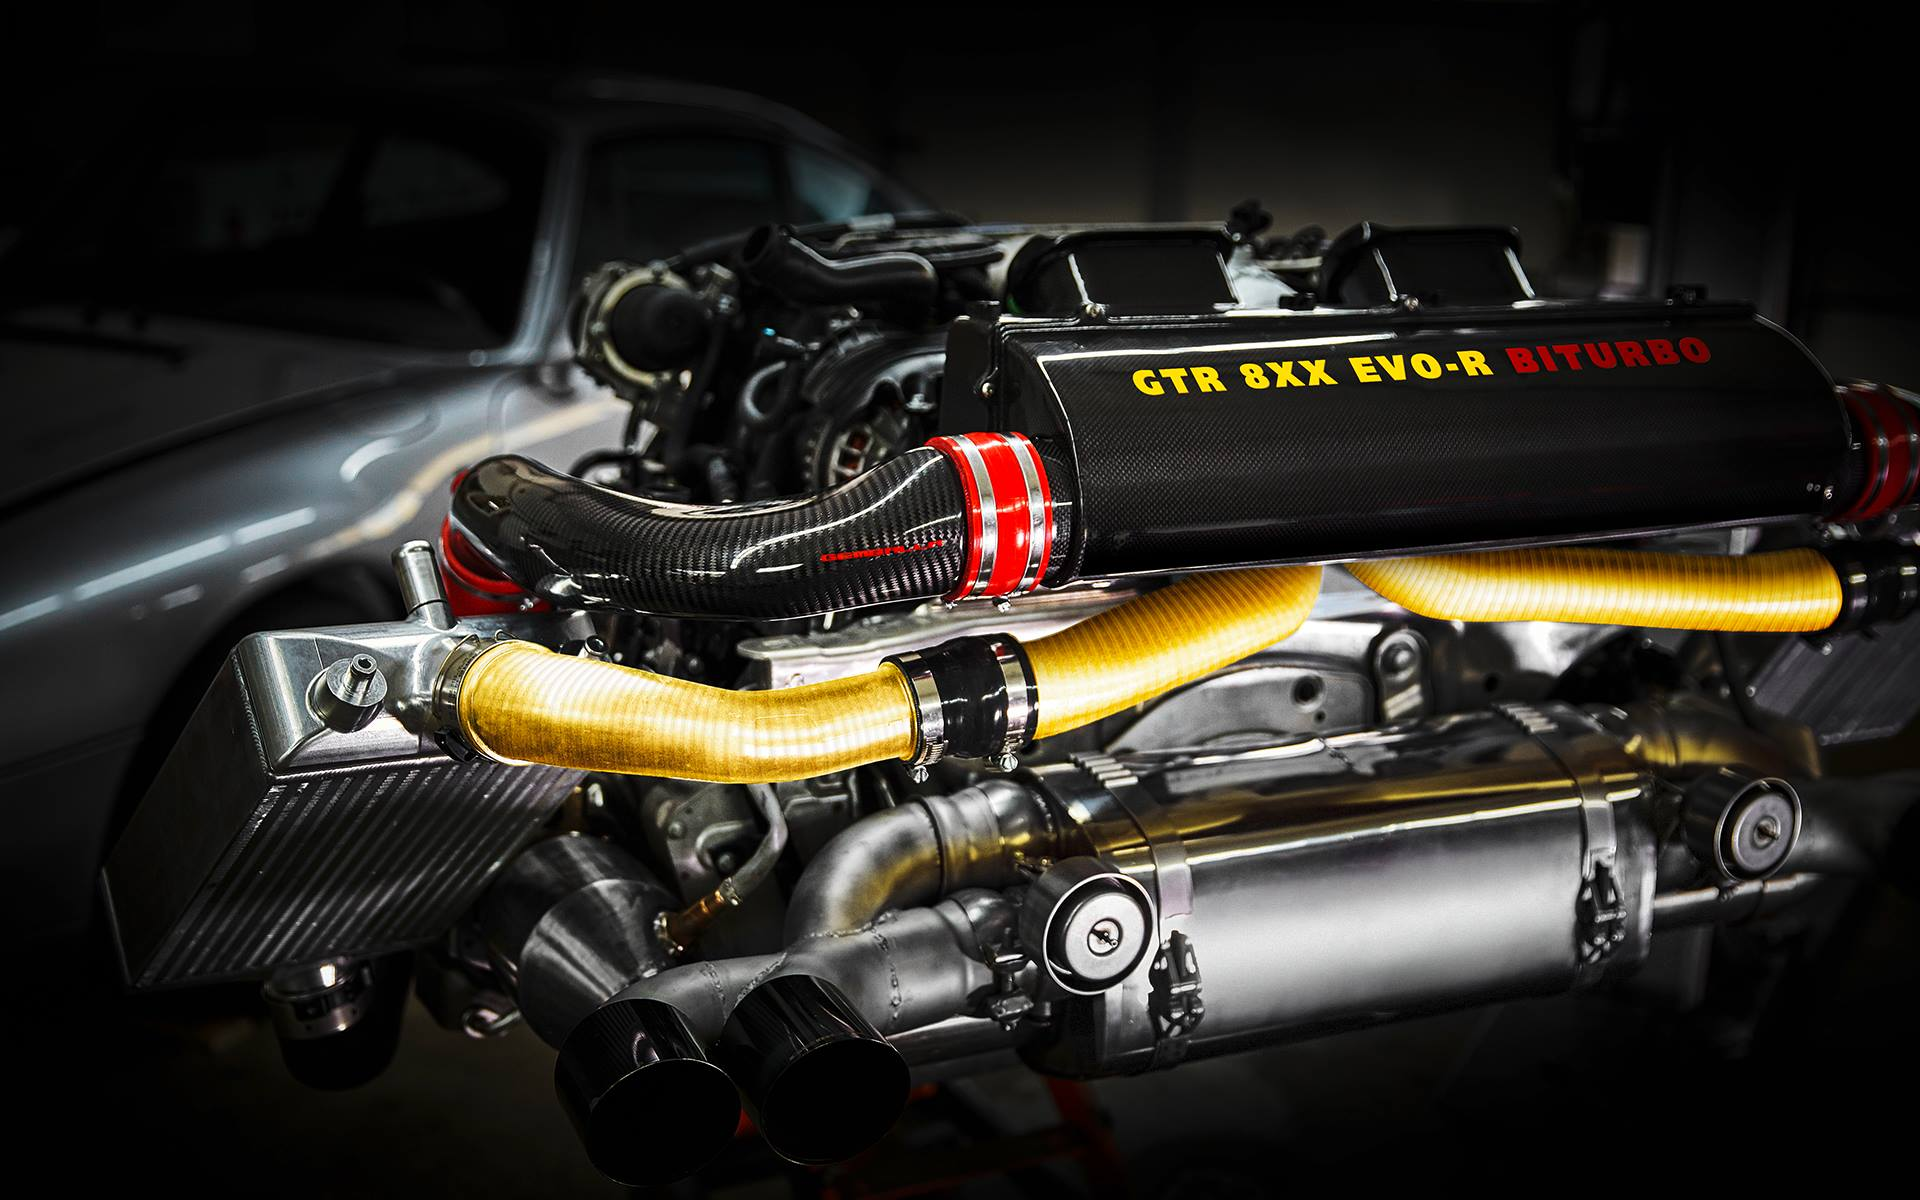 2015 Geneva Motor Show 3045 110x60 photo